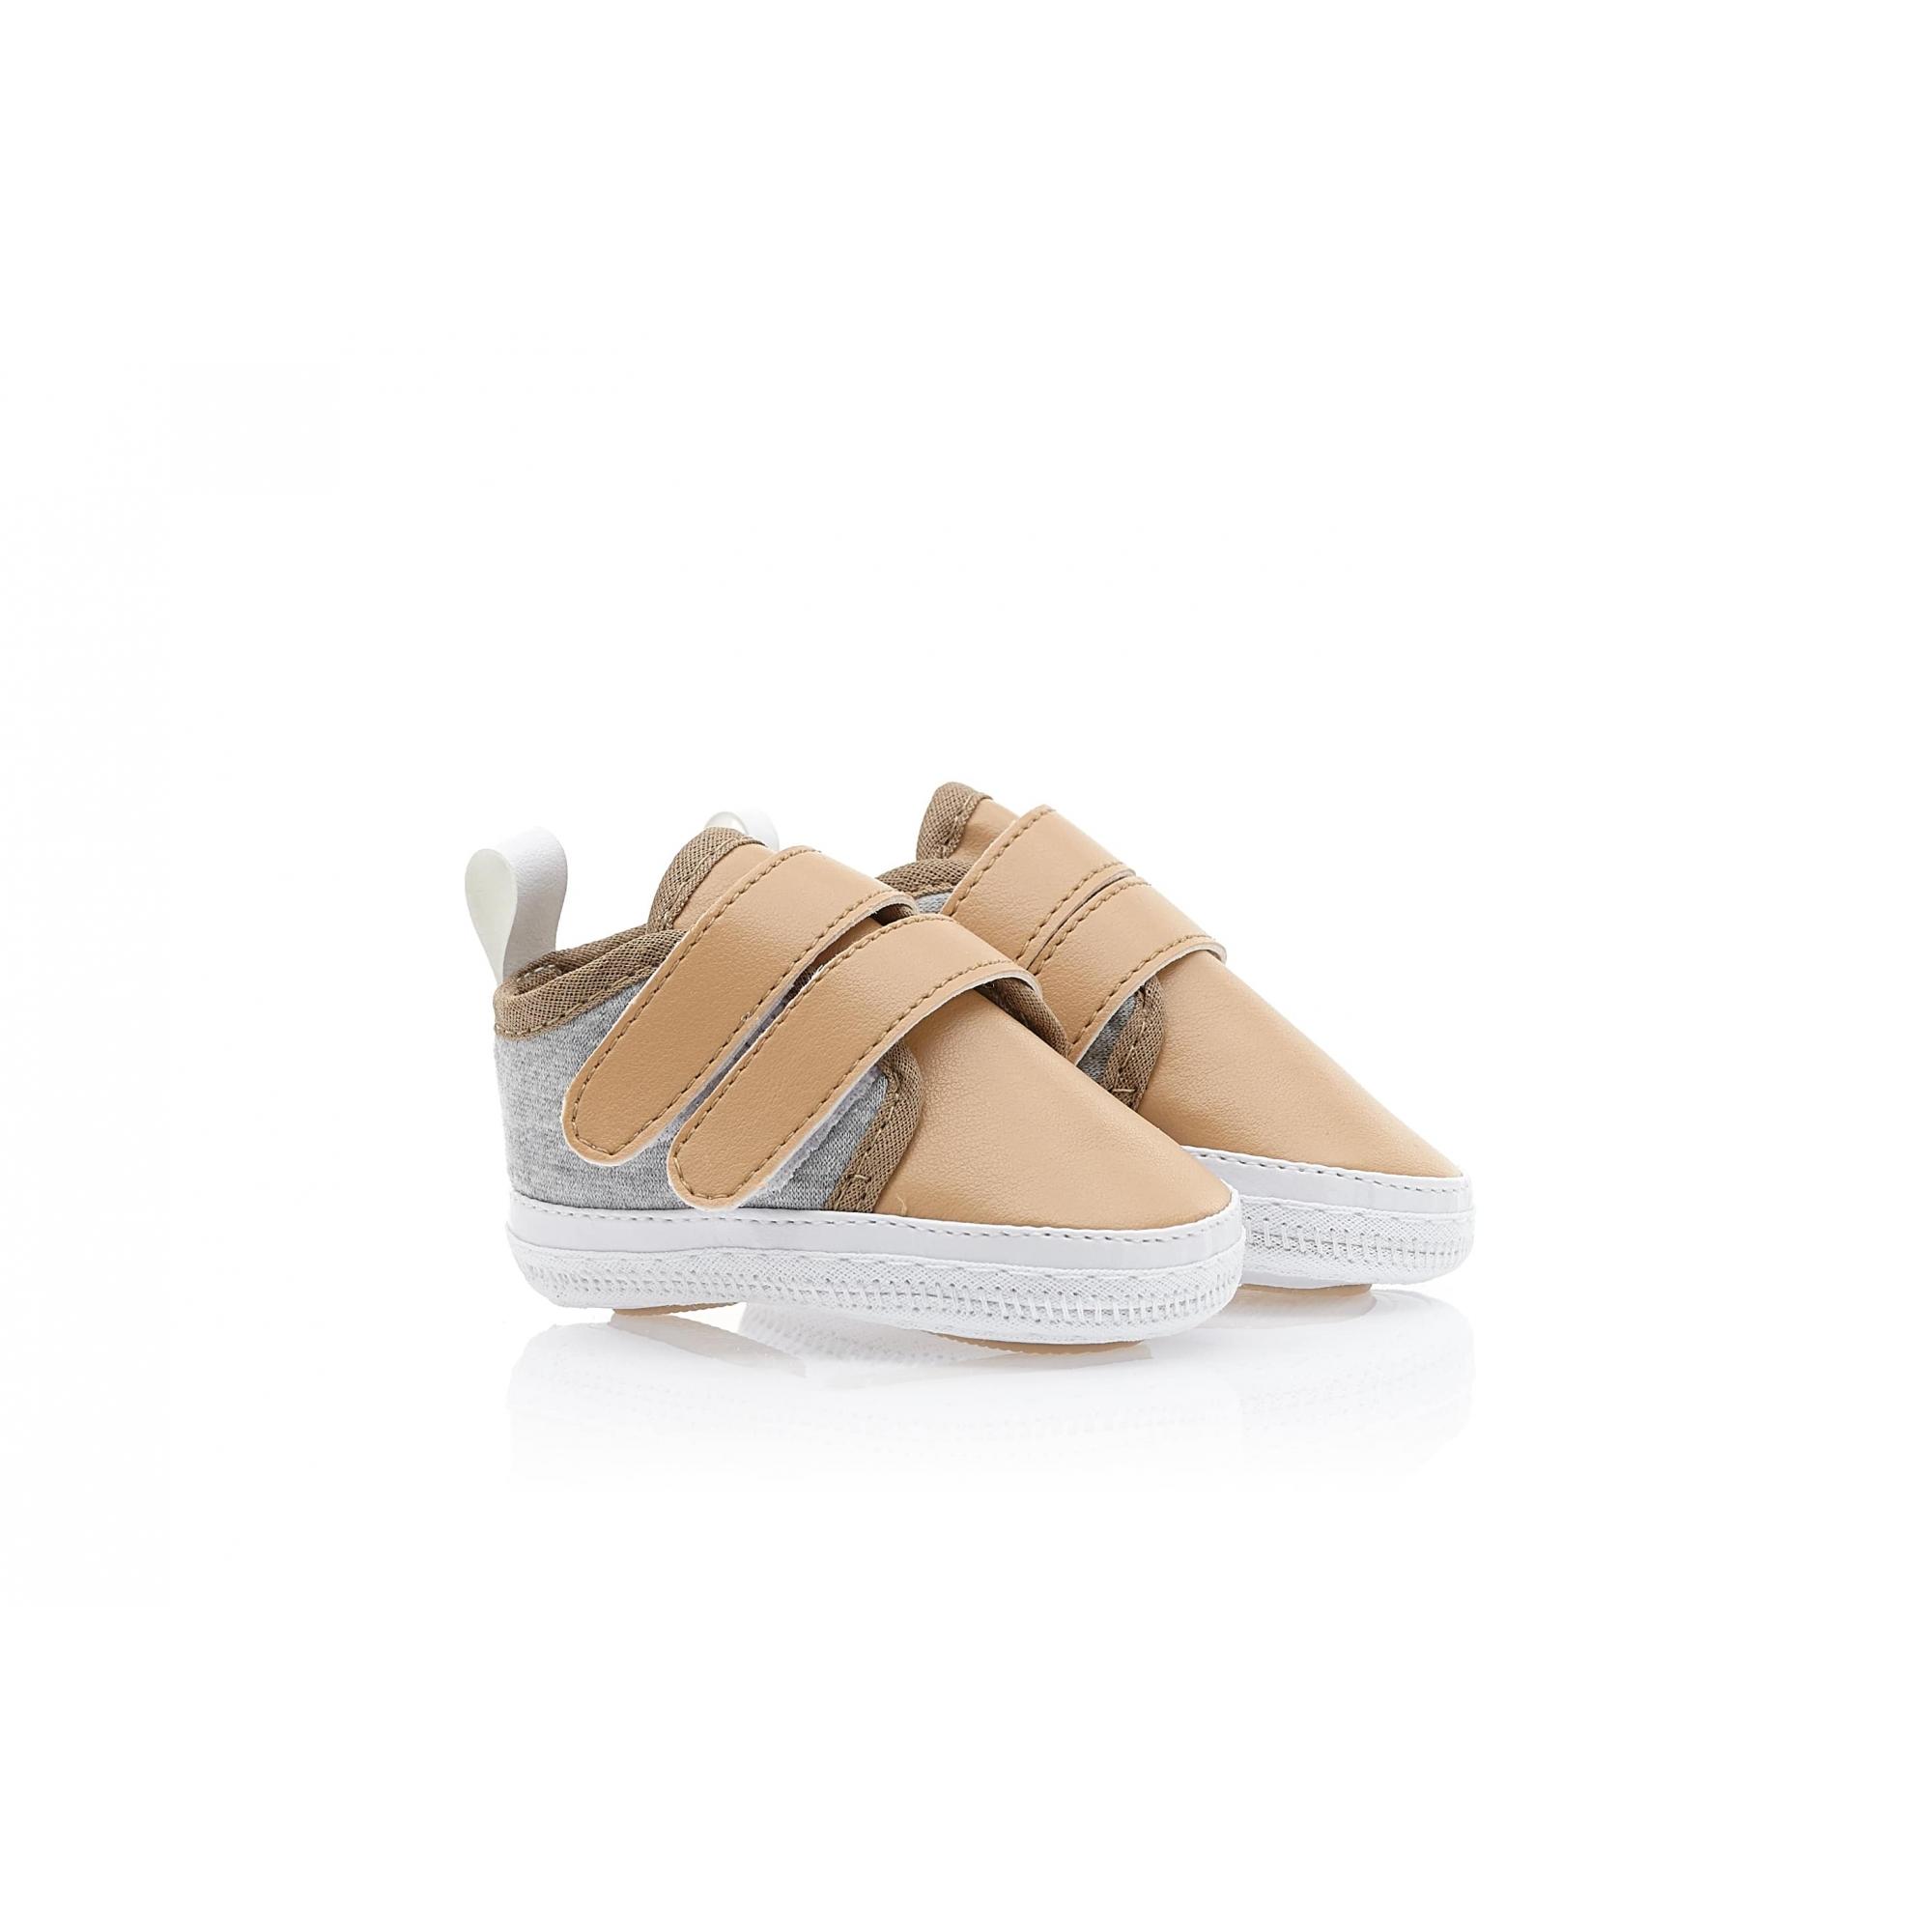 Tênis Bebê Velcro  Mescla  - Jeito Infantil